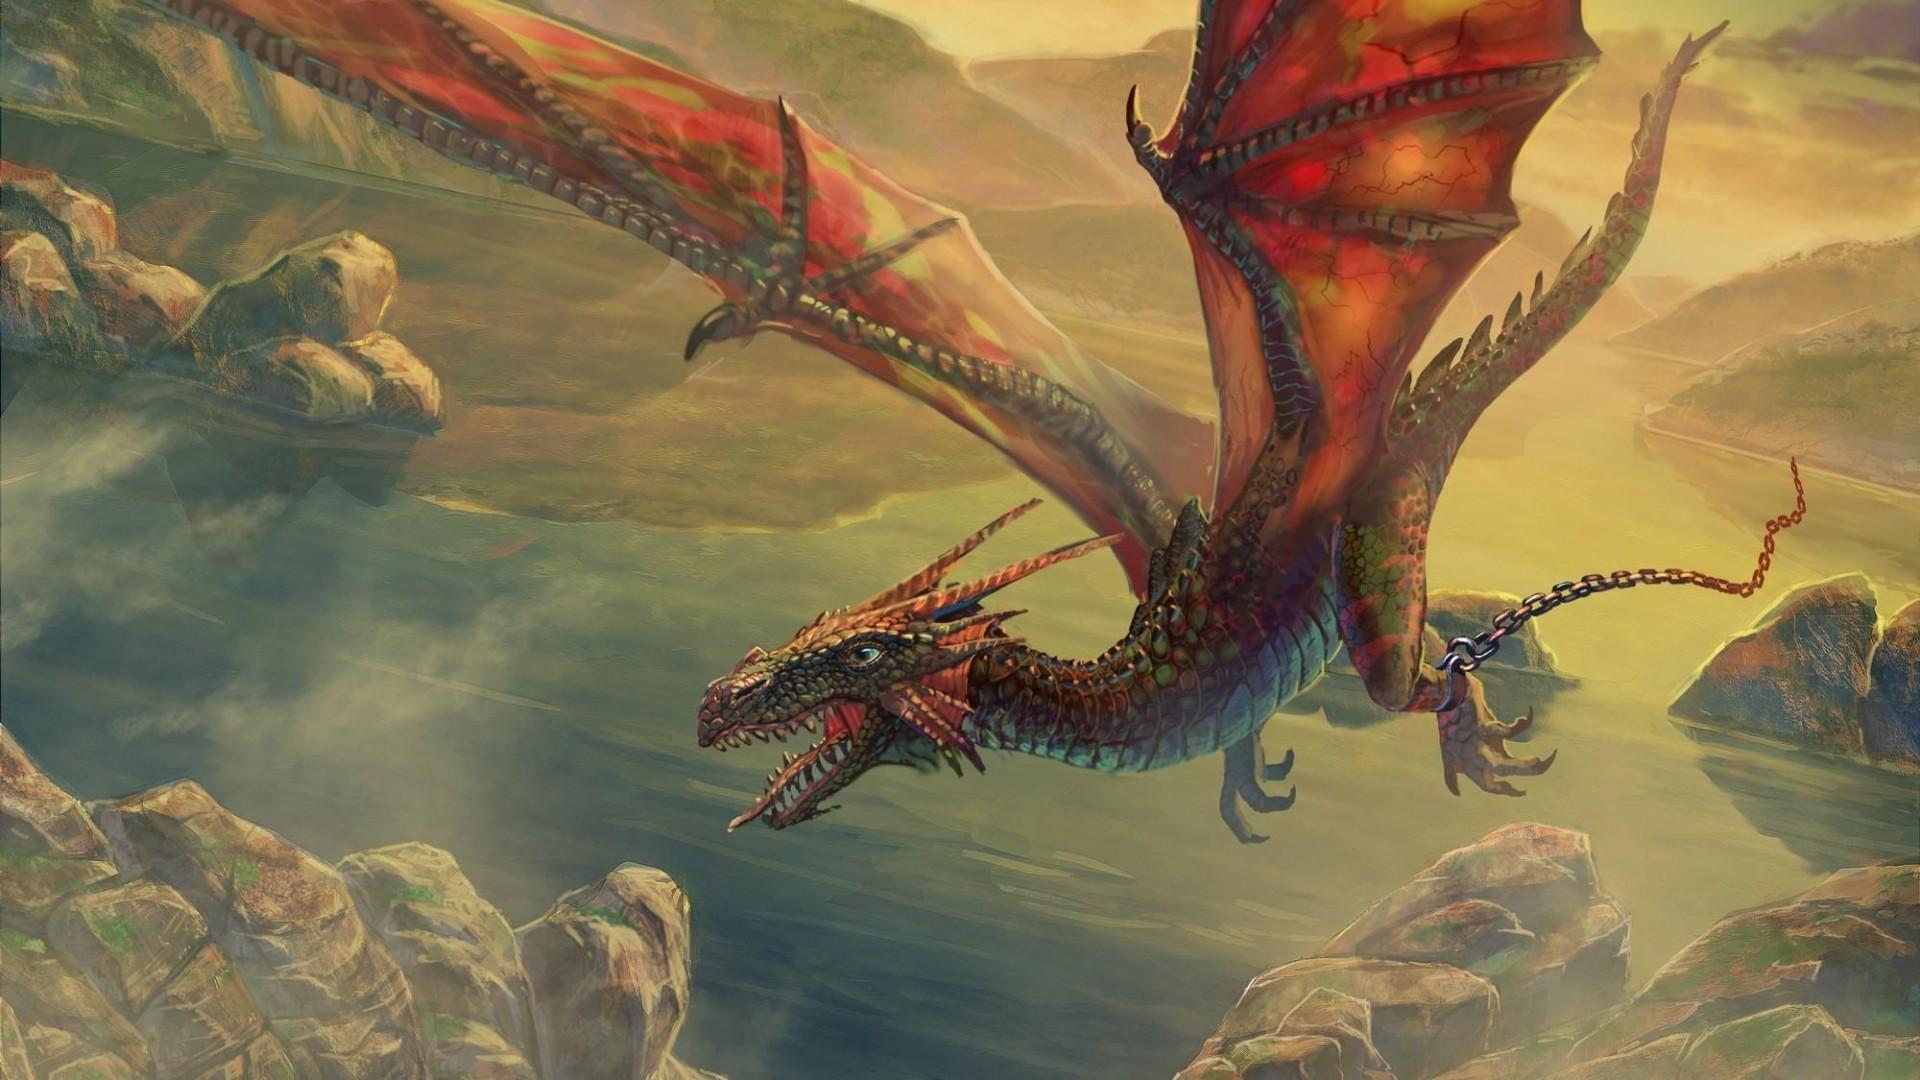 Dragon Wallpaper 1920x1080 (70+ images)